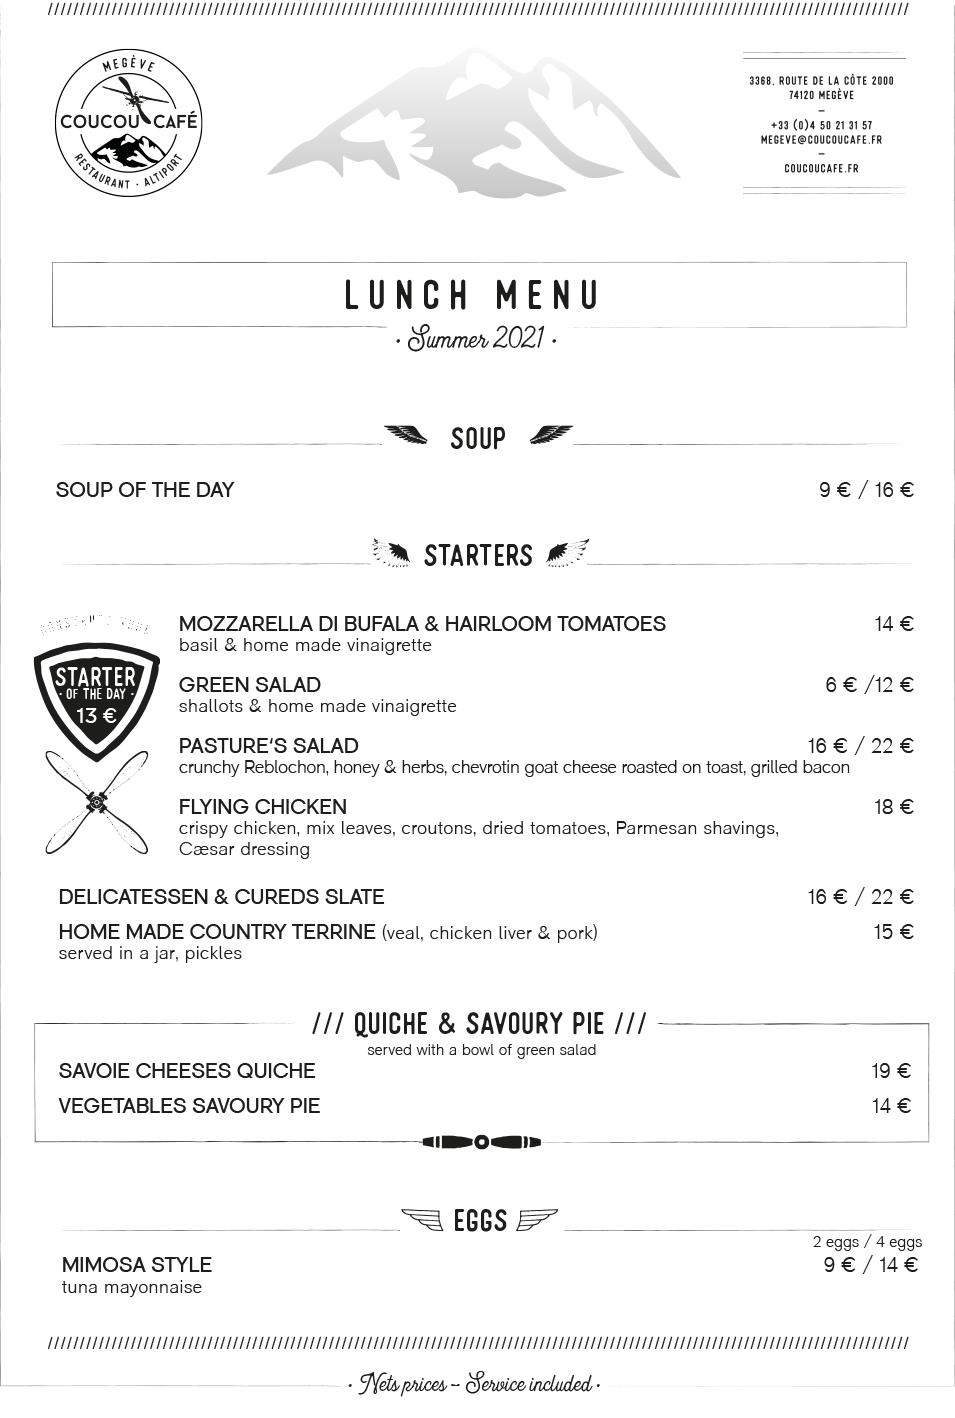 Lunch Menu - Summer 2021